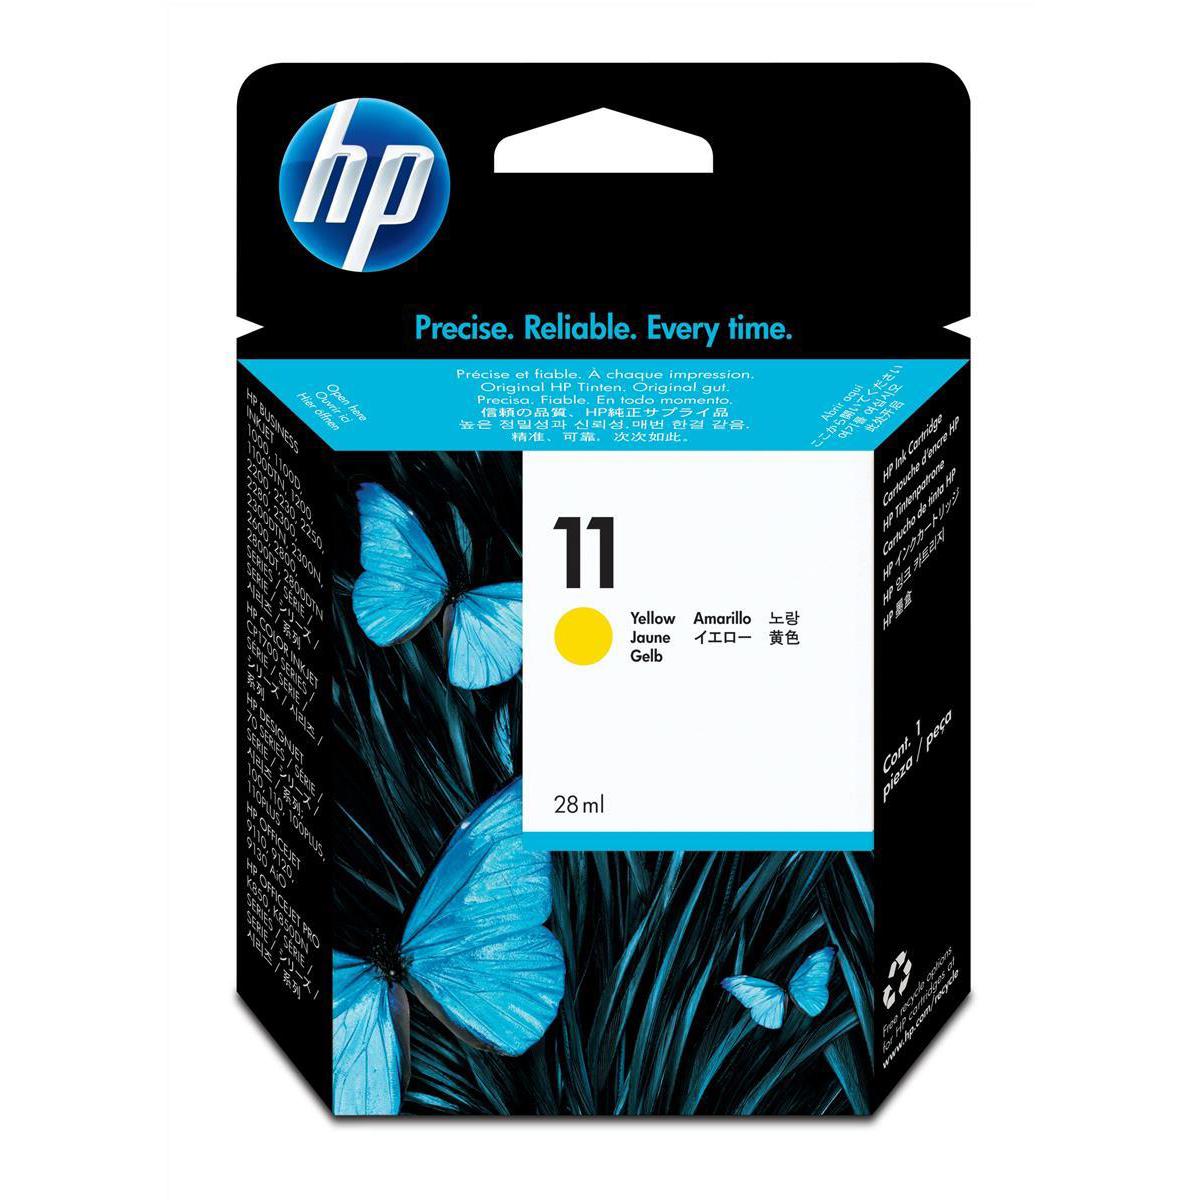 Hewlett Packard [HP] No.11 Inkjet Cartridge Page Life 2350pp 28ml Yellow Ref C4838A